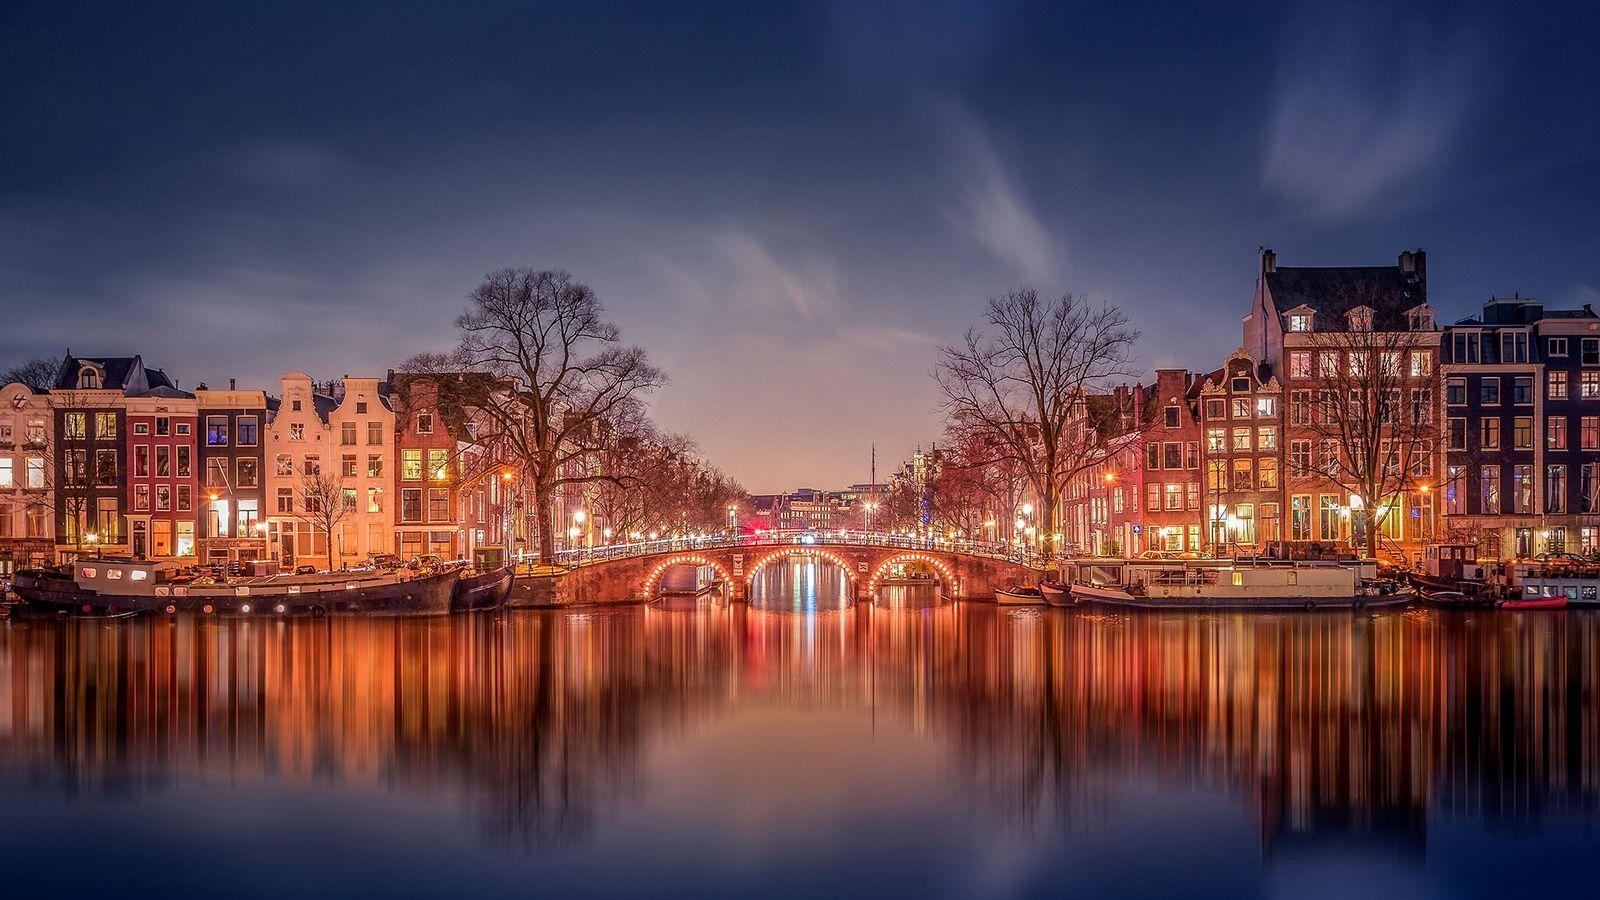 5. Netherlands